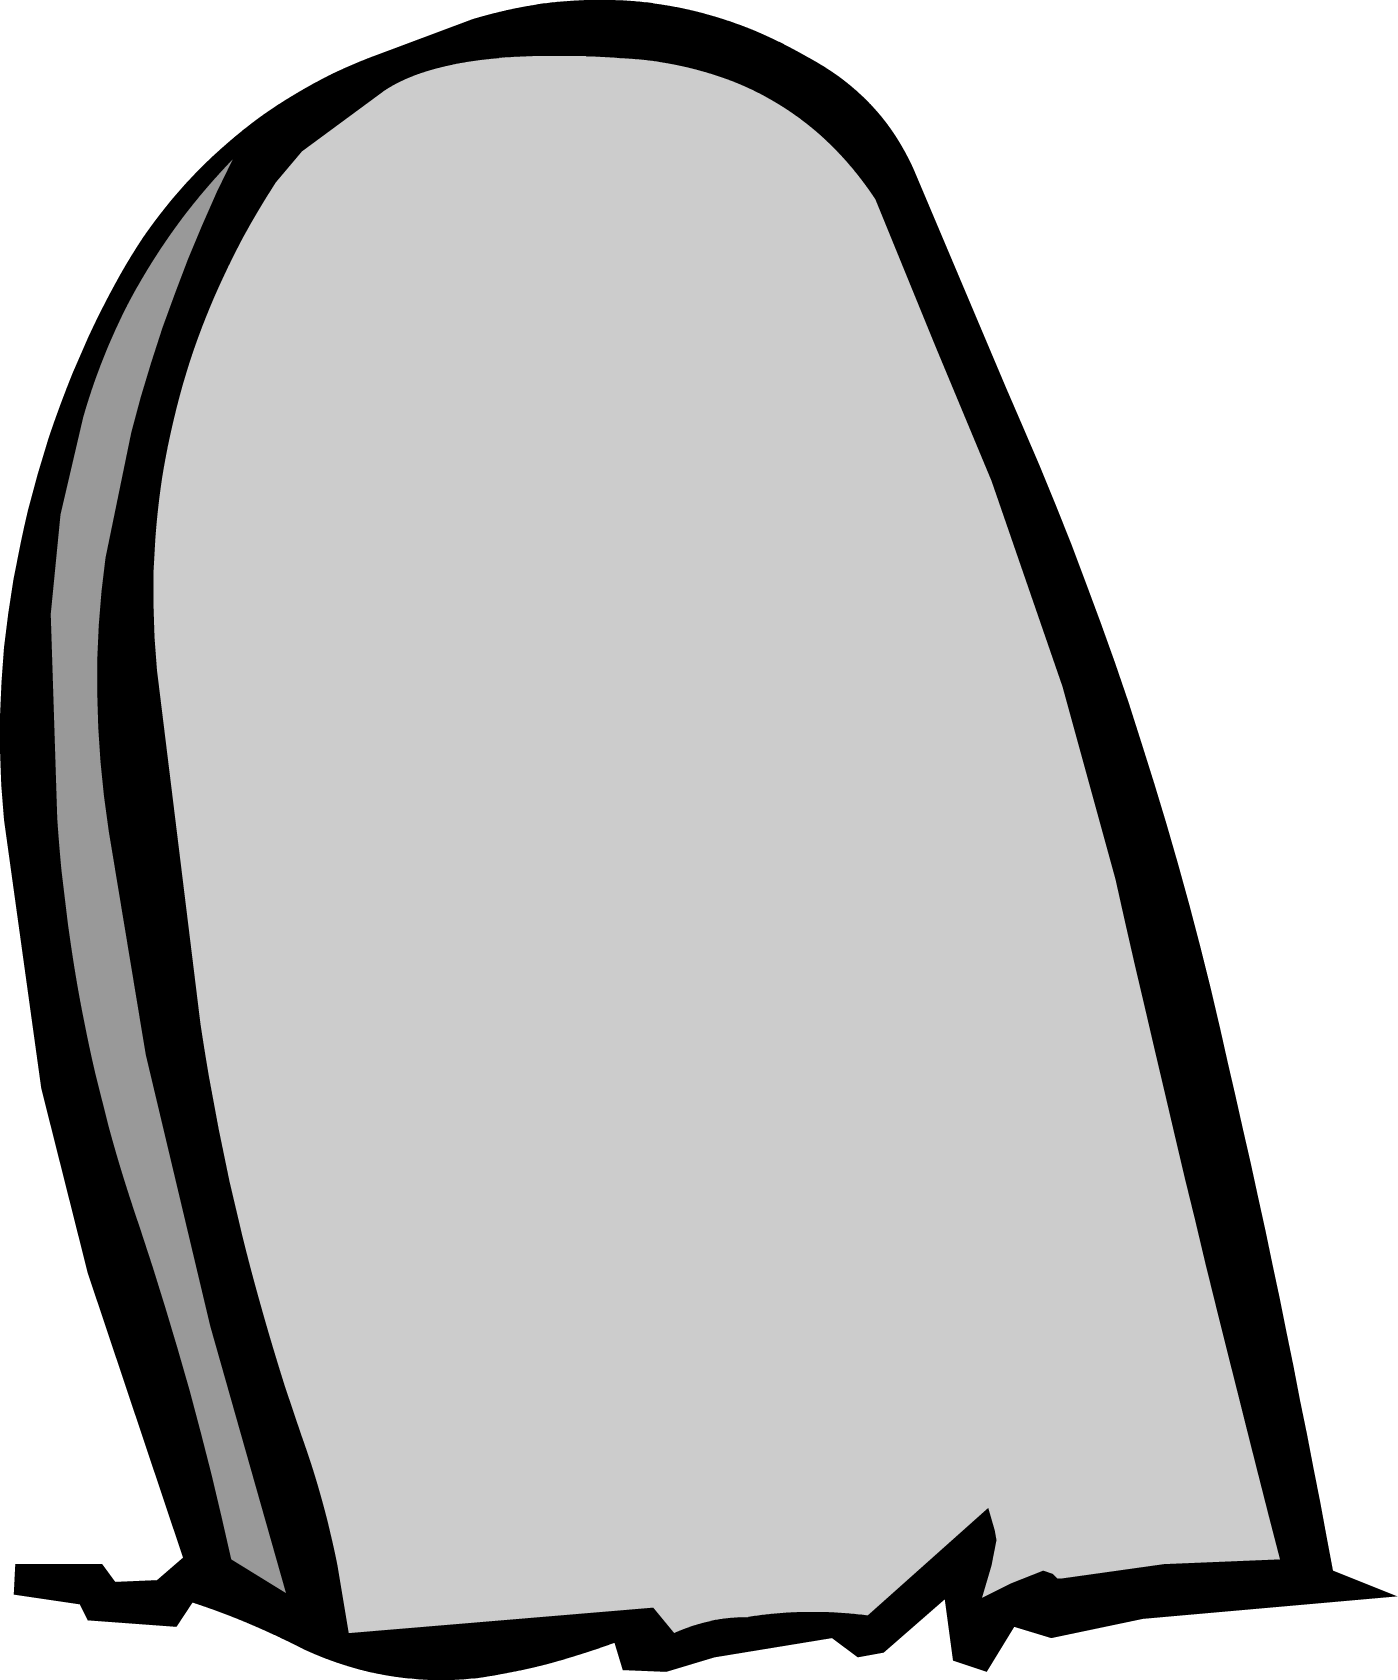 ... Tombstone | Club Penguin Wiki | Fandom powered by Wikia; Blank ...